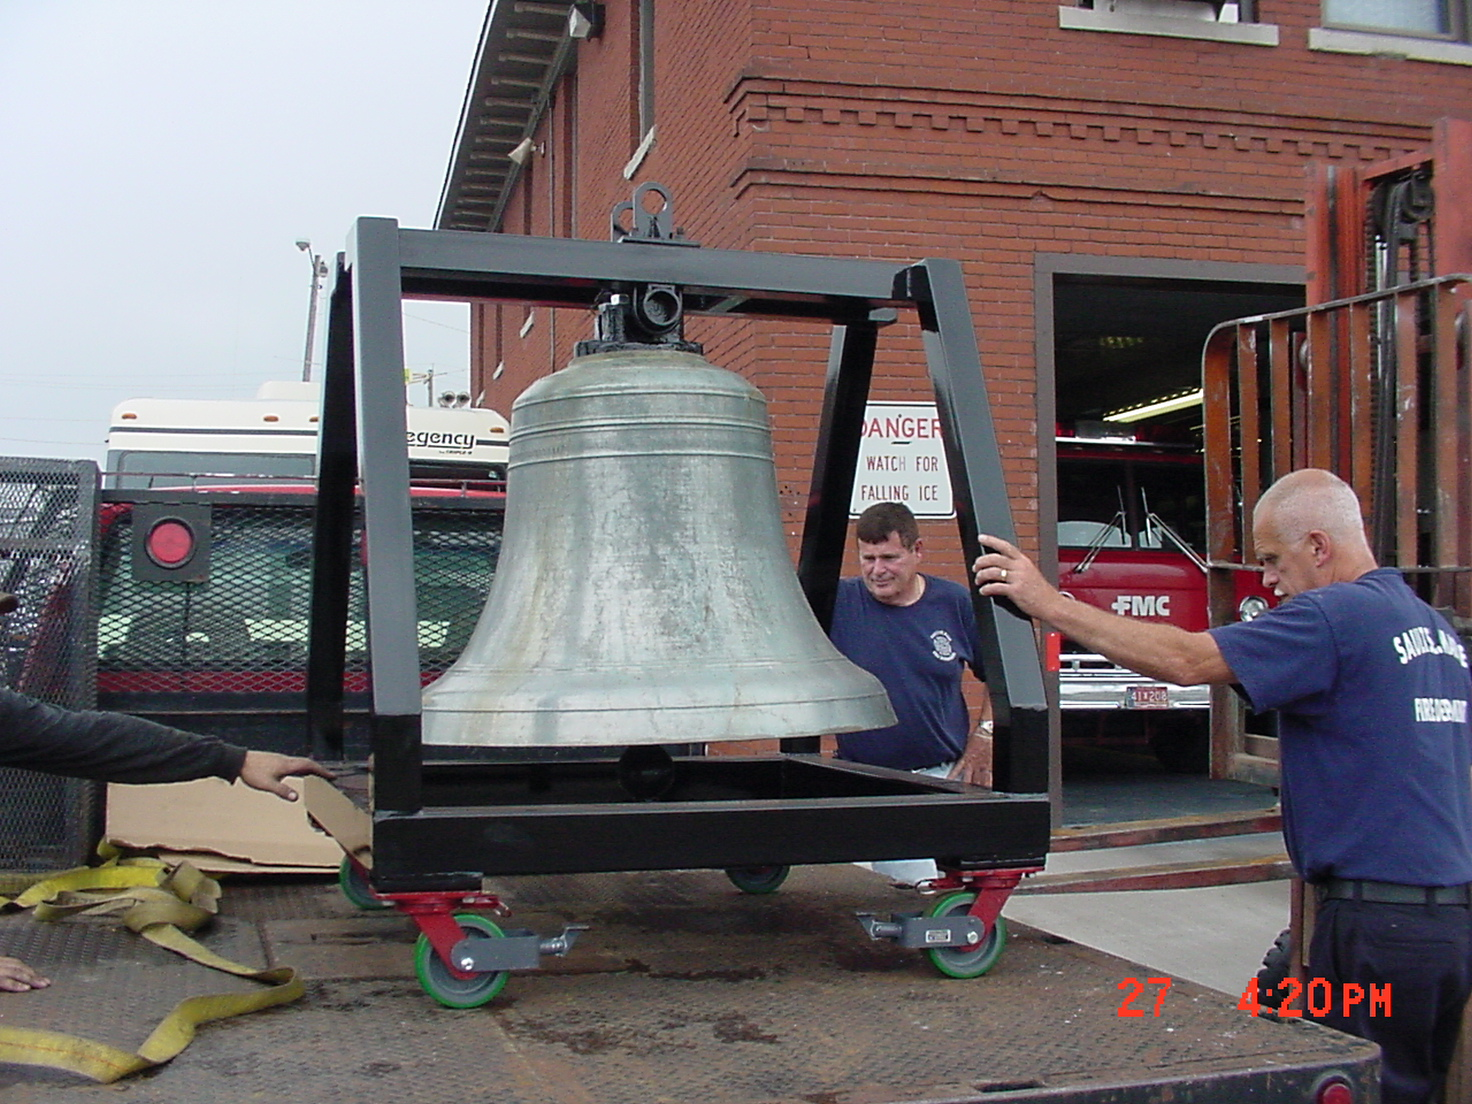 7-27-2007 - Return of The Bell 002